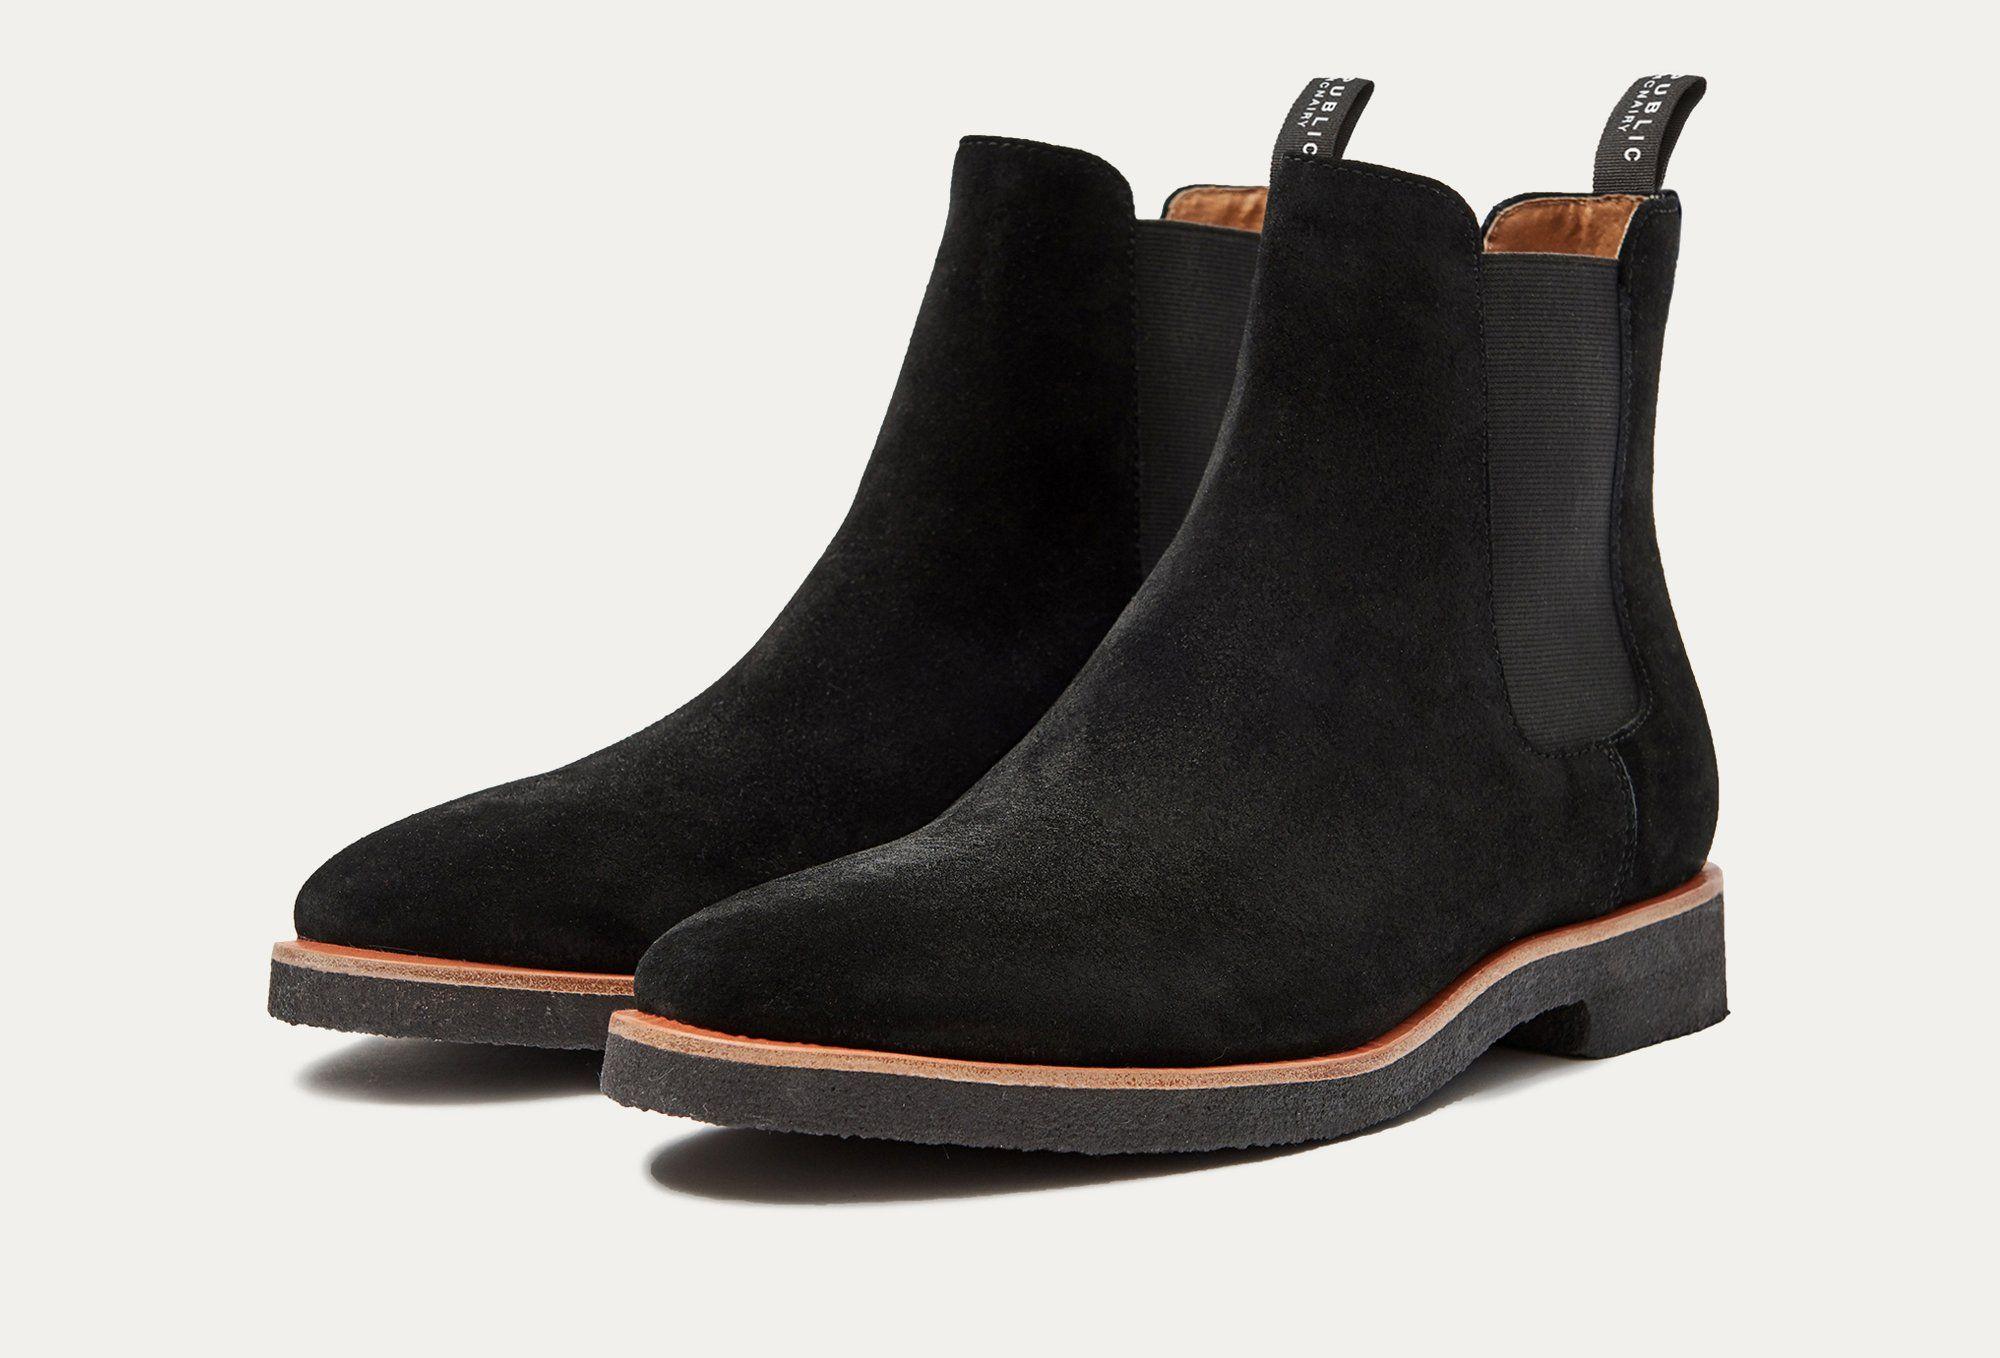 Harvey Suede Chelsea Boot in Black by